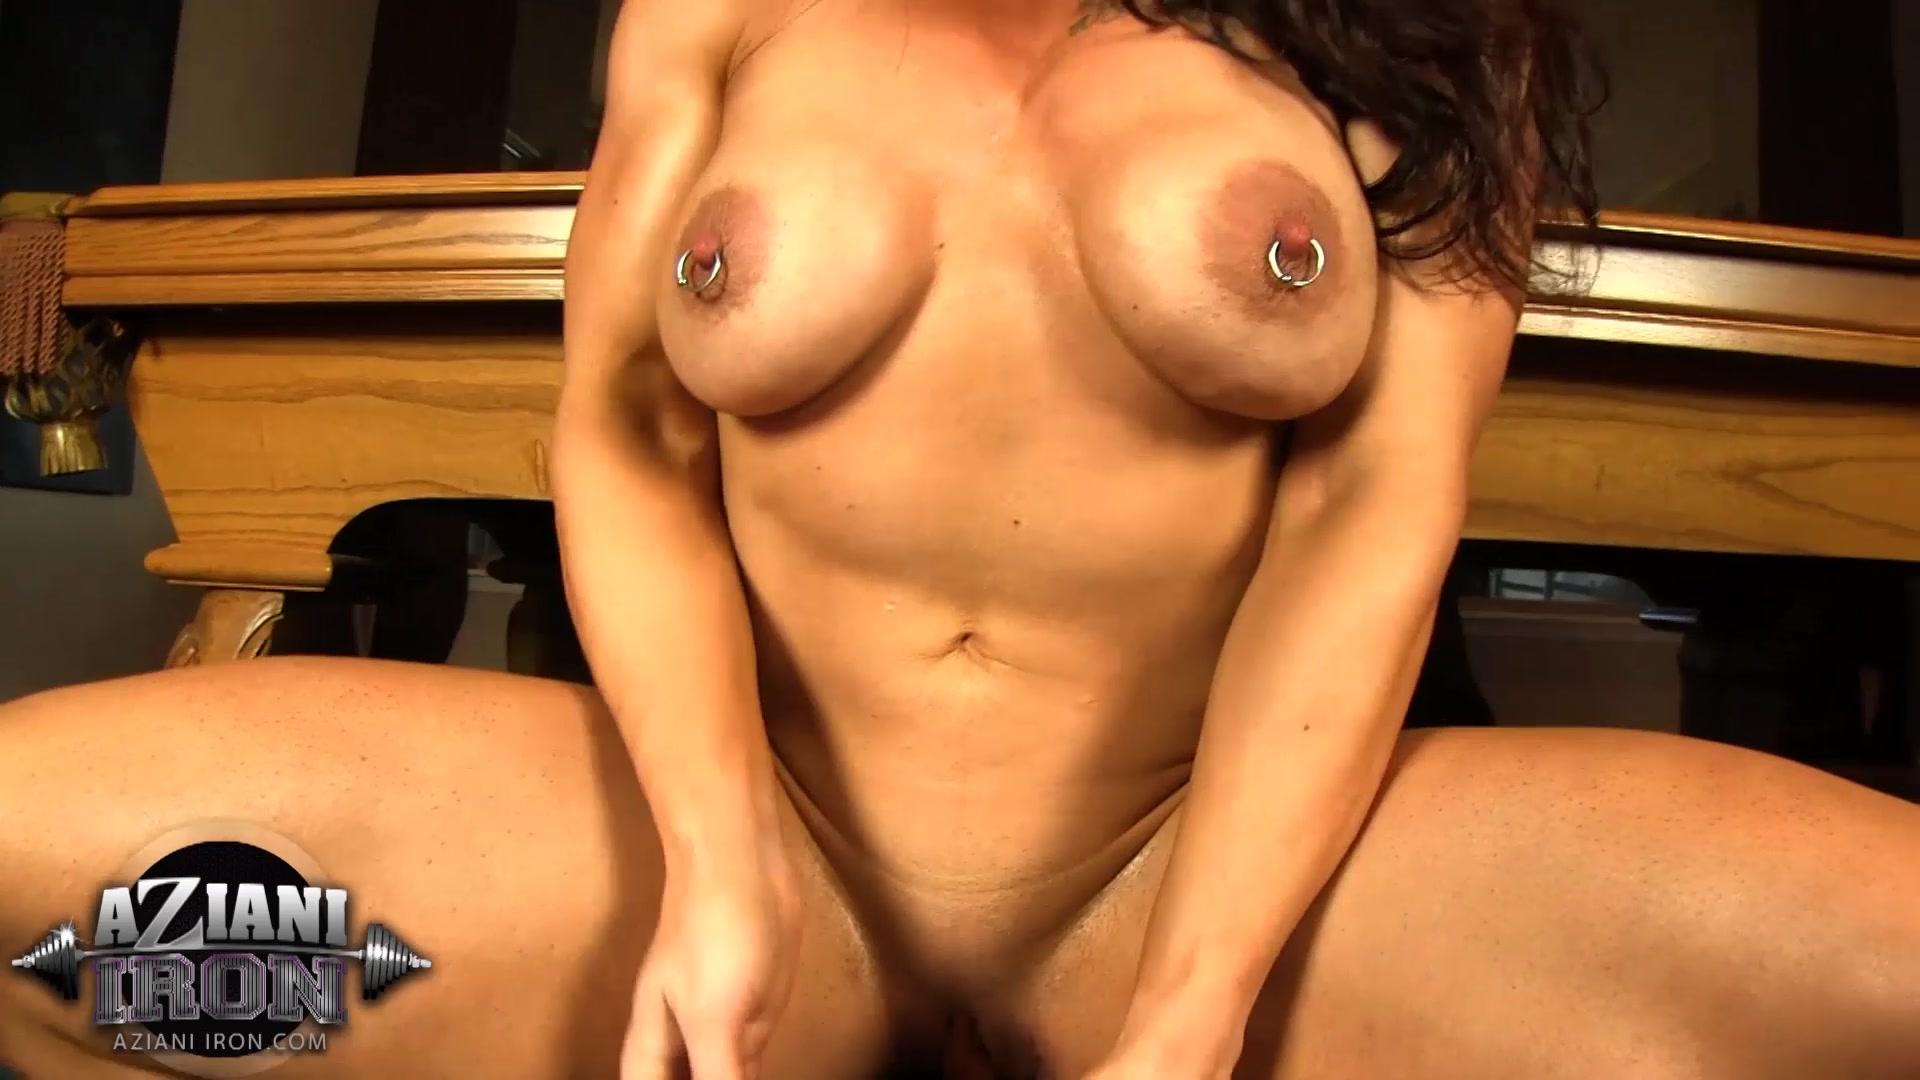 Hd Brandi Mae Aziani Iron Pumps Her Big Clit Porn Pics